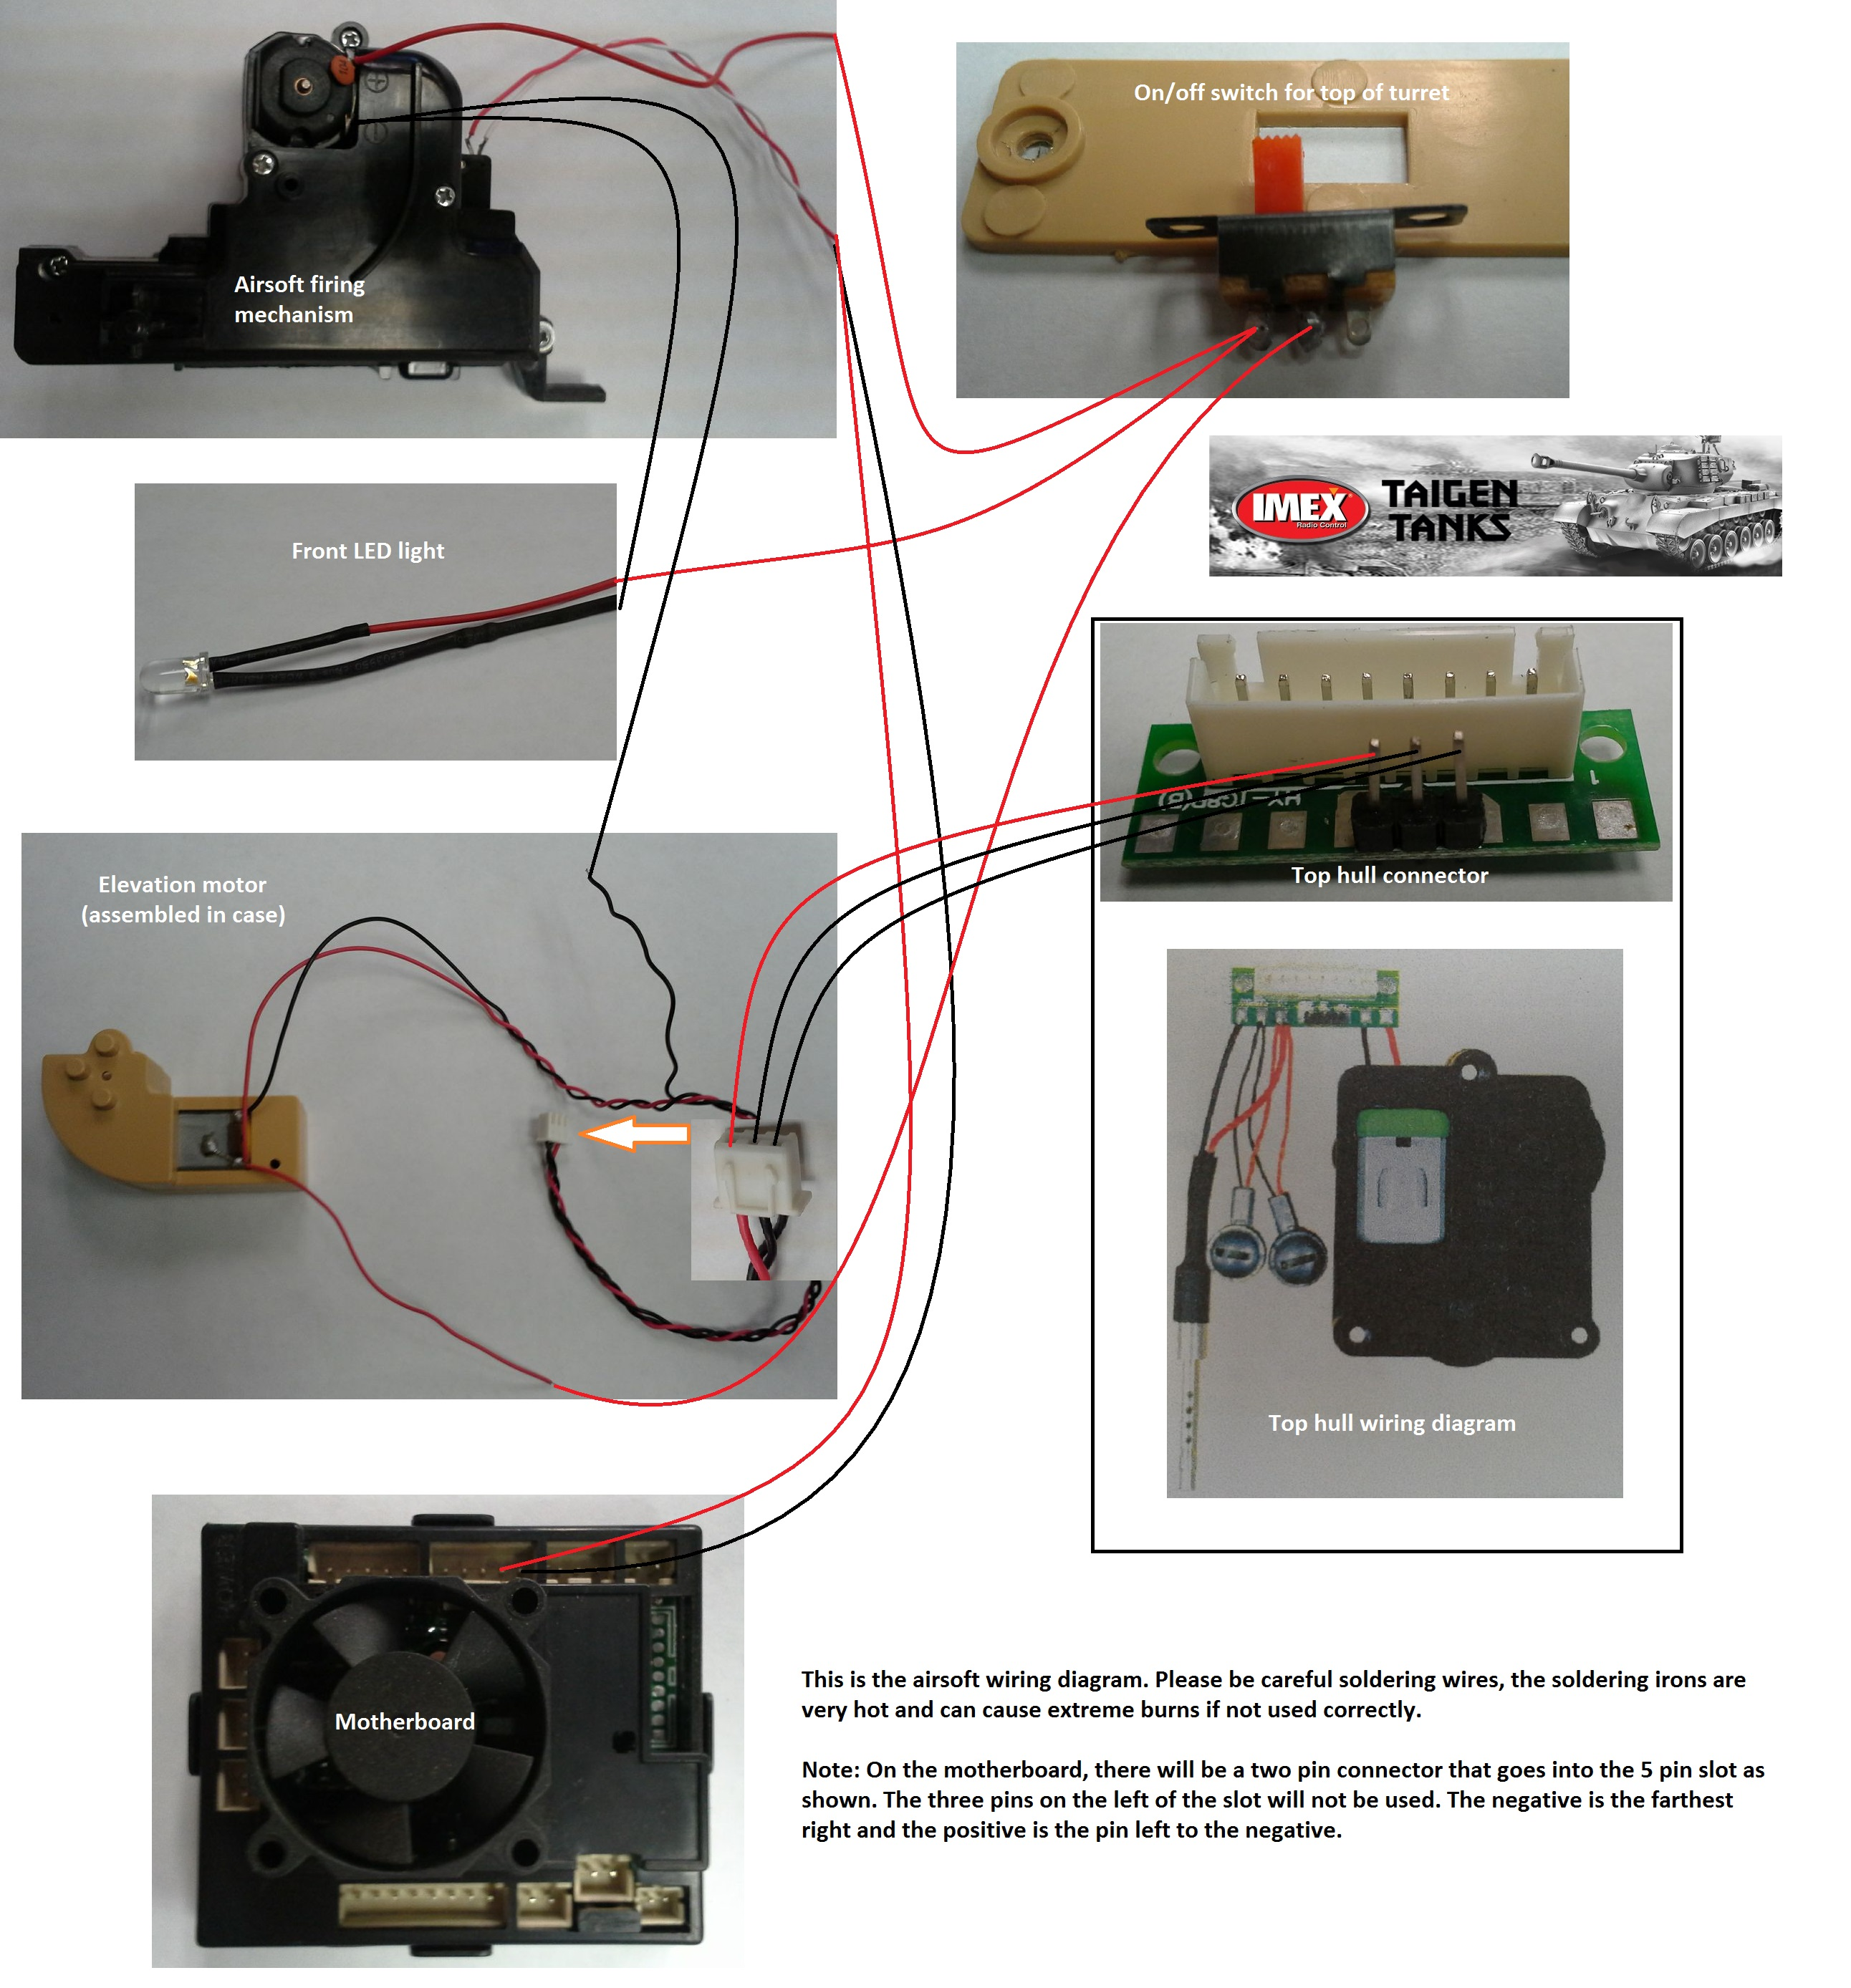 Click image for larger version  Name:Wiring Diagram for tiger main gun.jpg Views:67 Size:1.06 MB ID:2220997